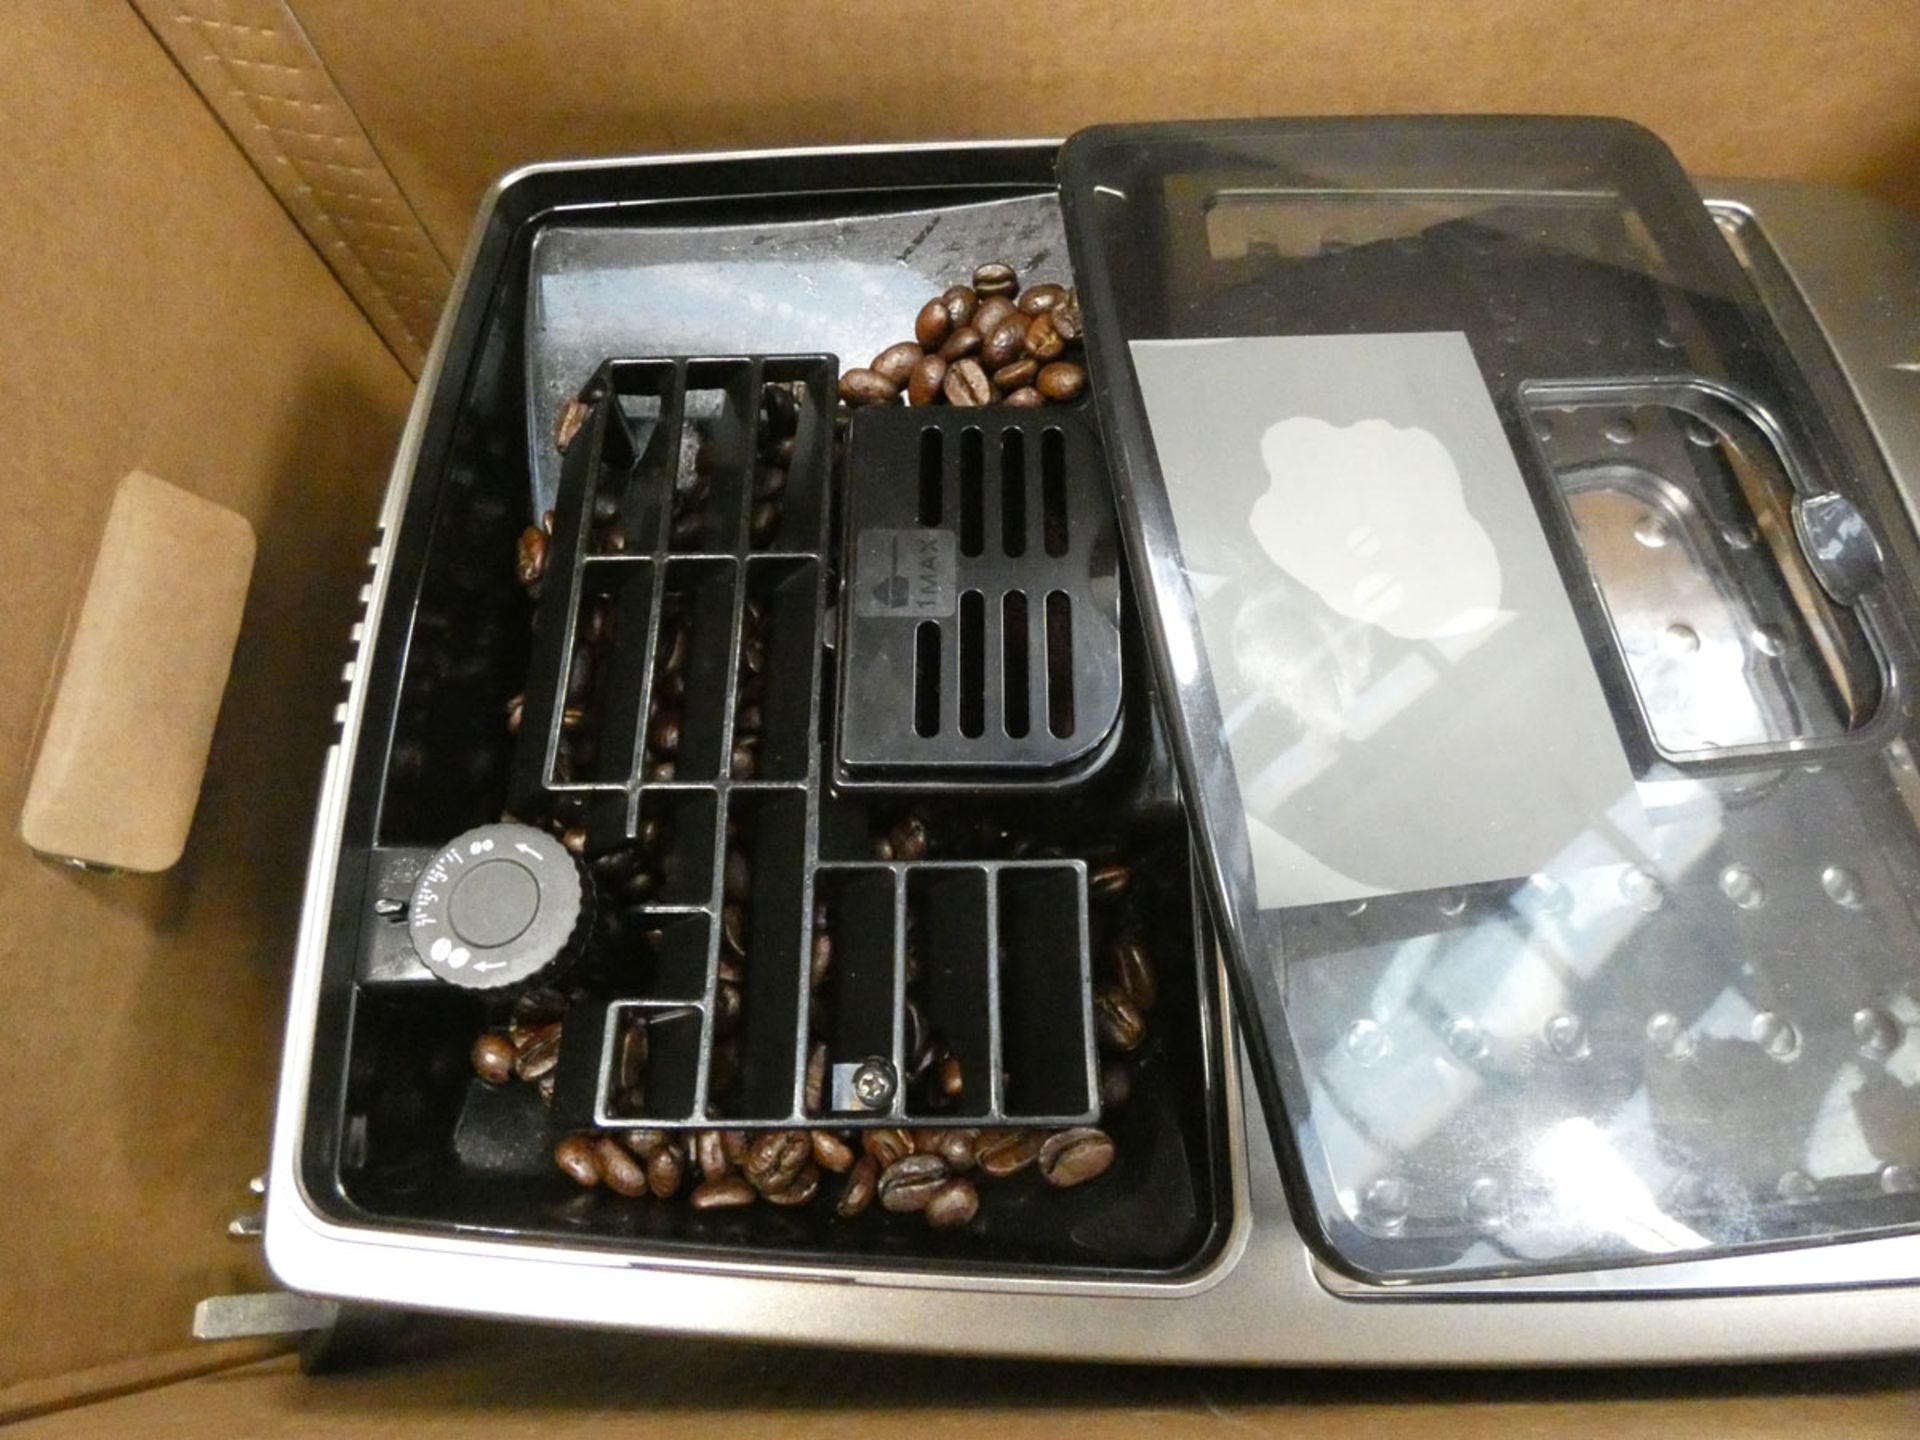 3007 - Boxed De'Longhi Magnifica smart coffee machine - Image 2 of 2